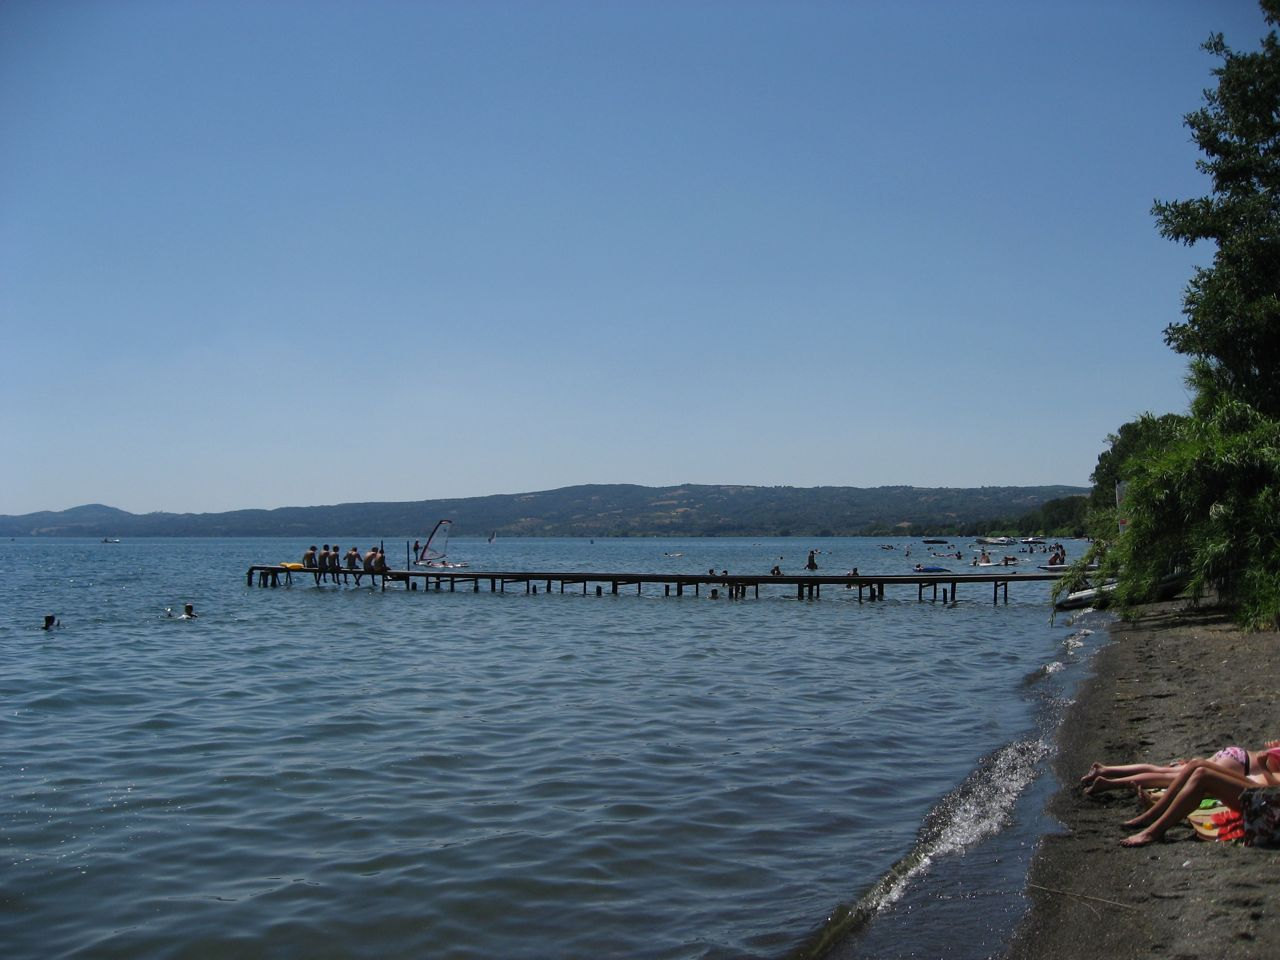 Ein Badetag am See